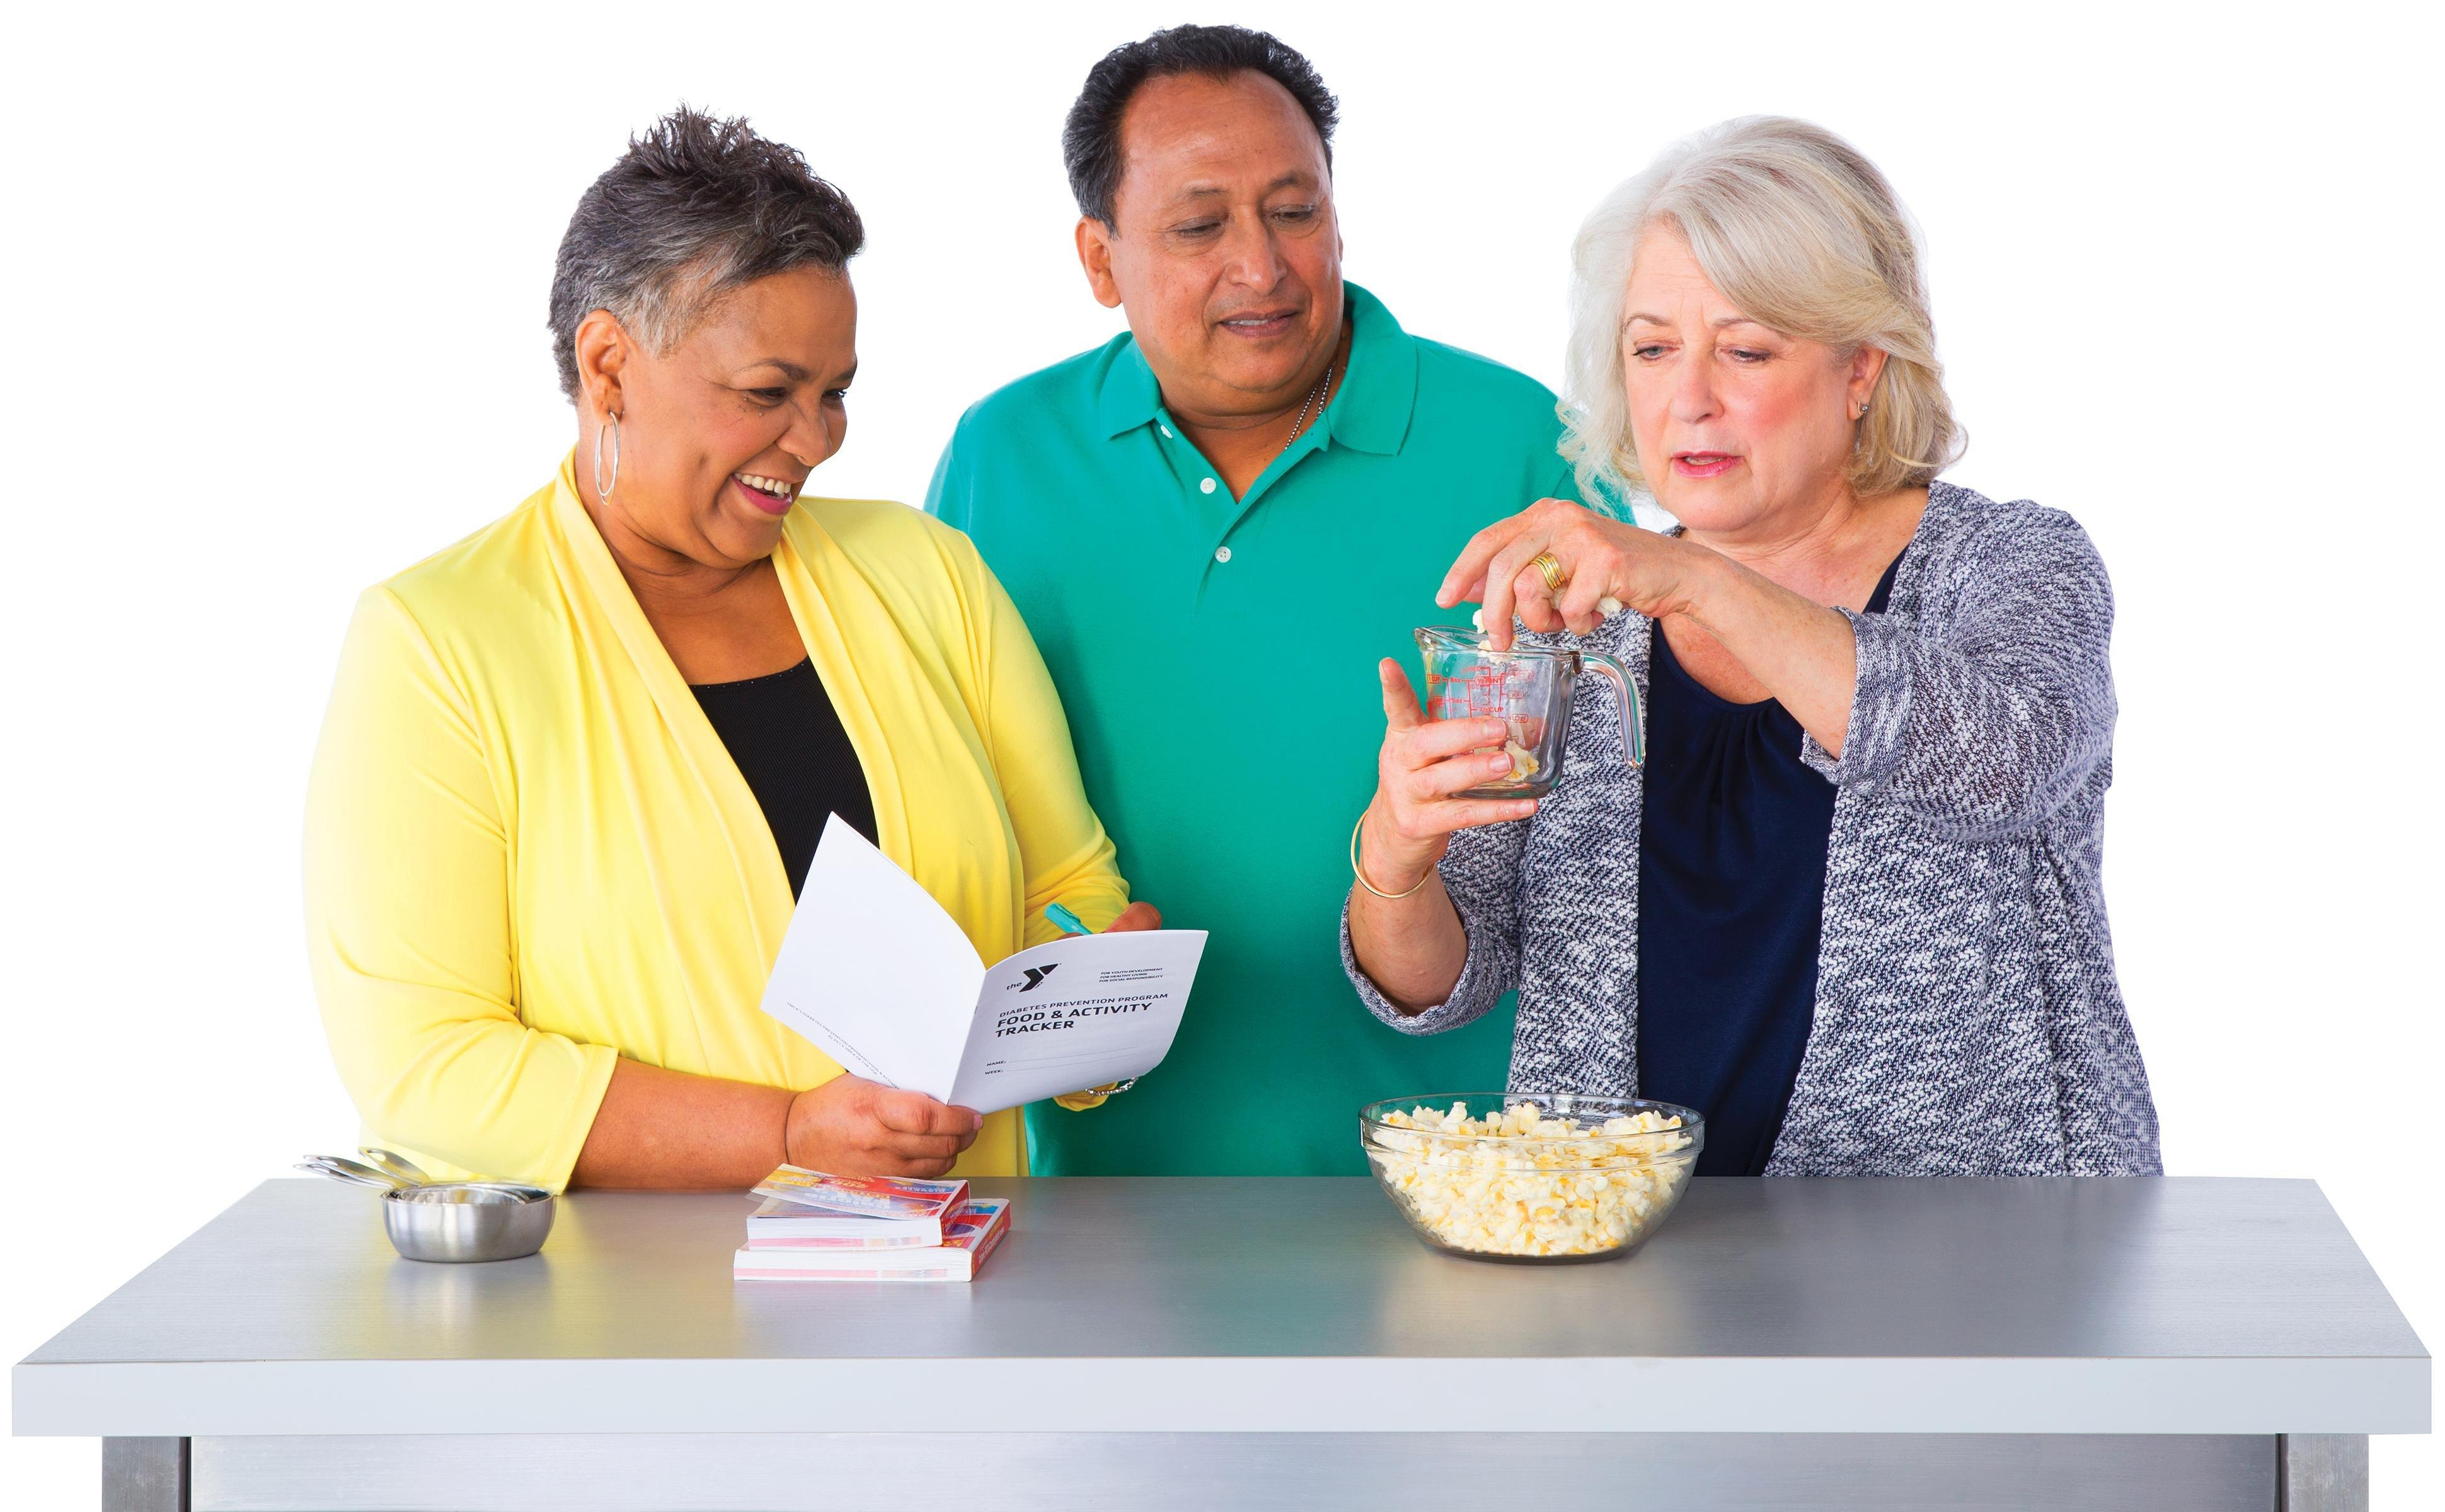 November Is National Diabetes Awareness Month